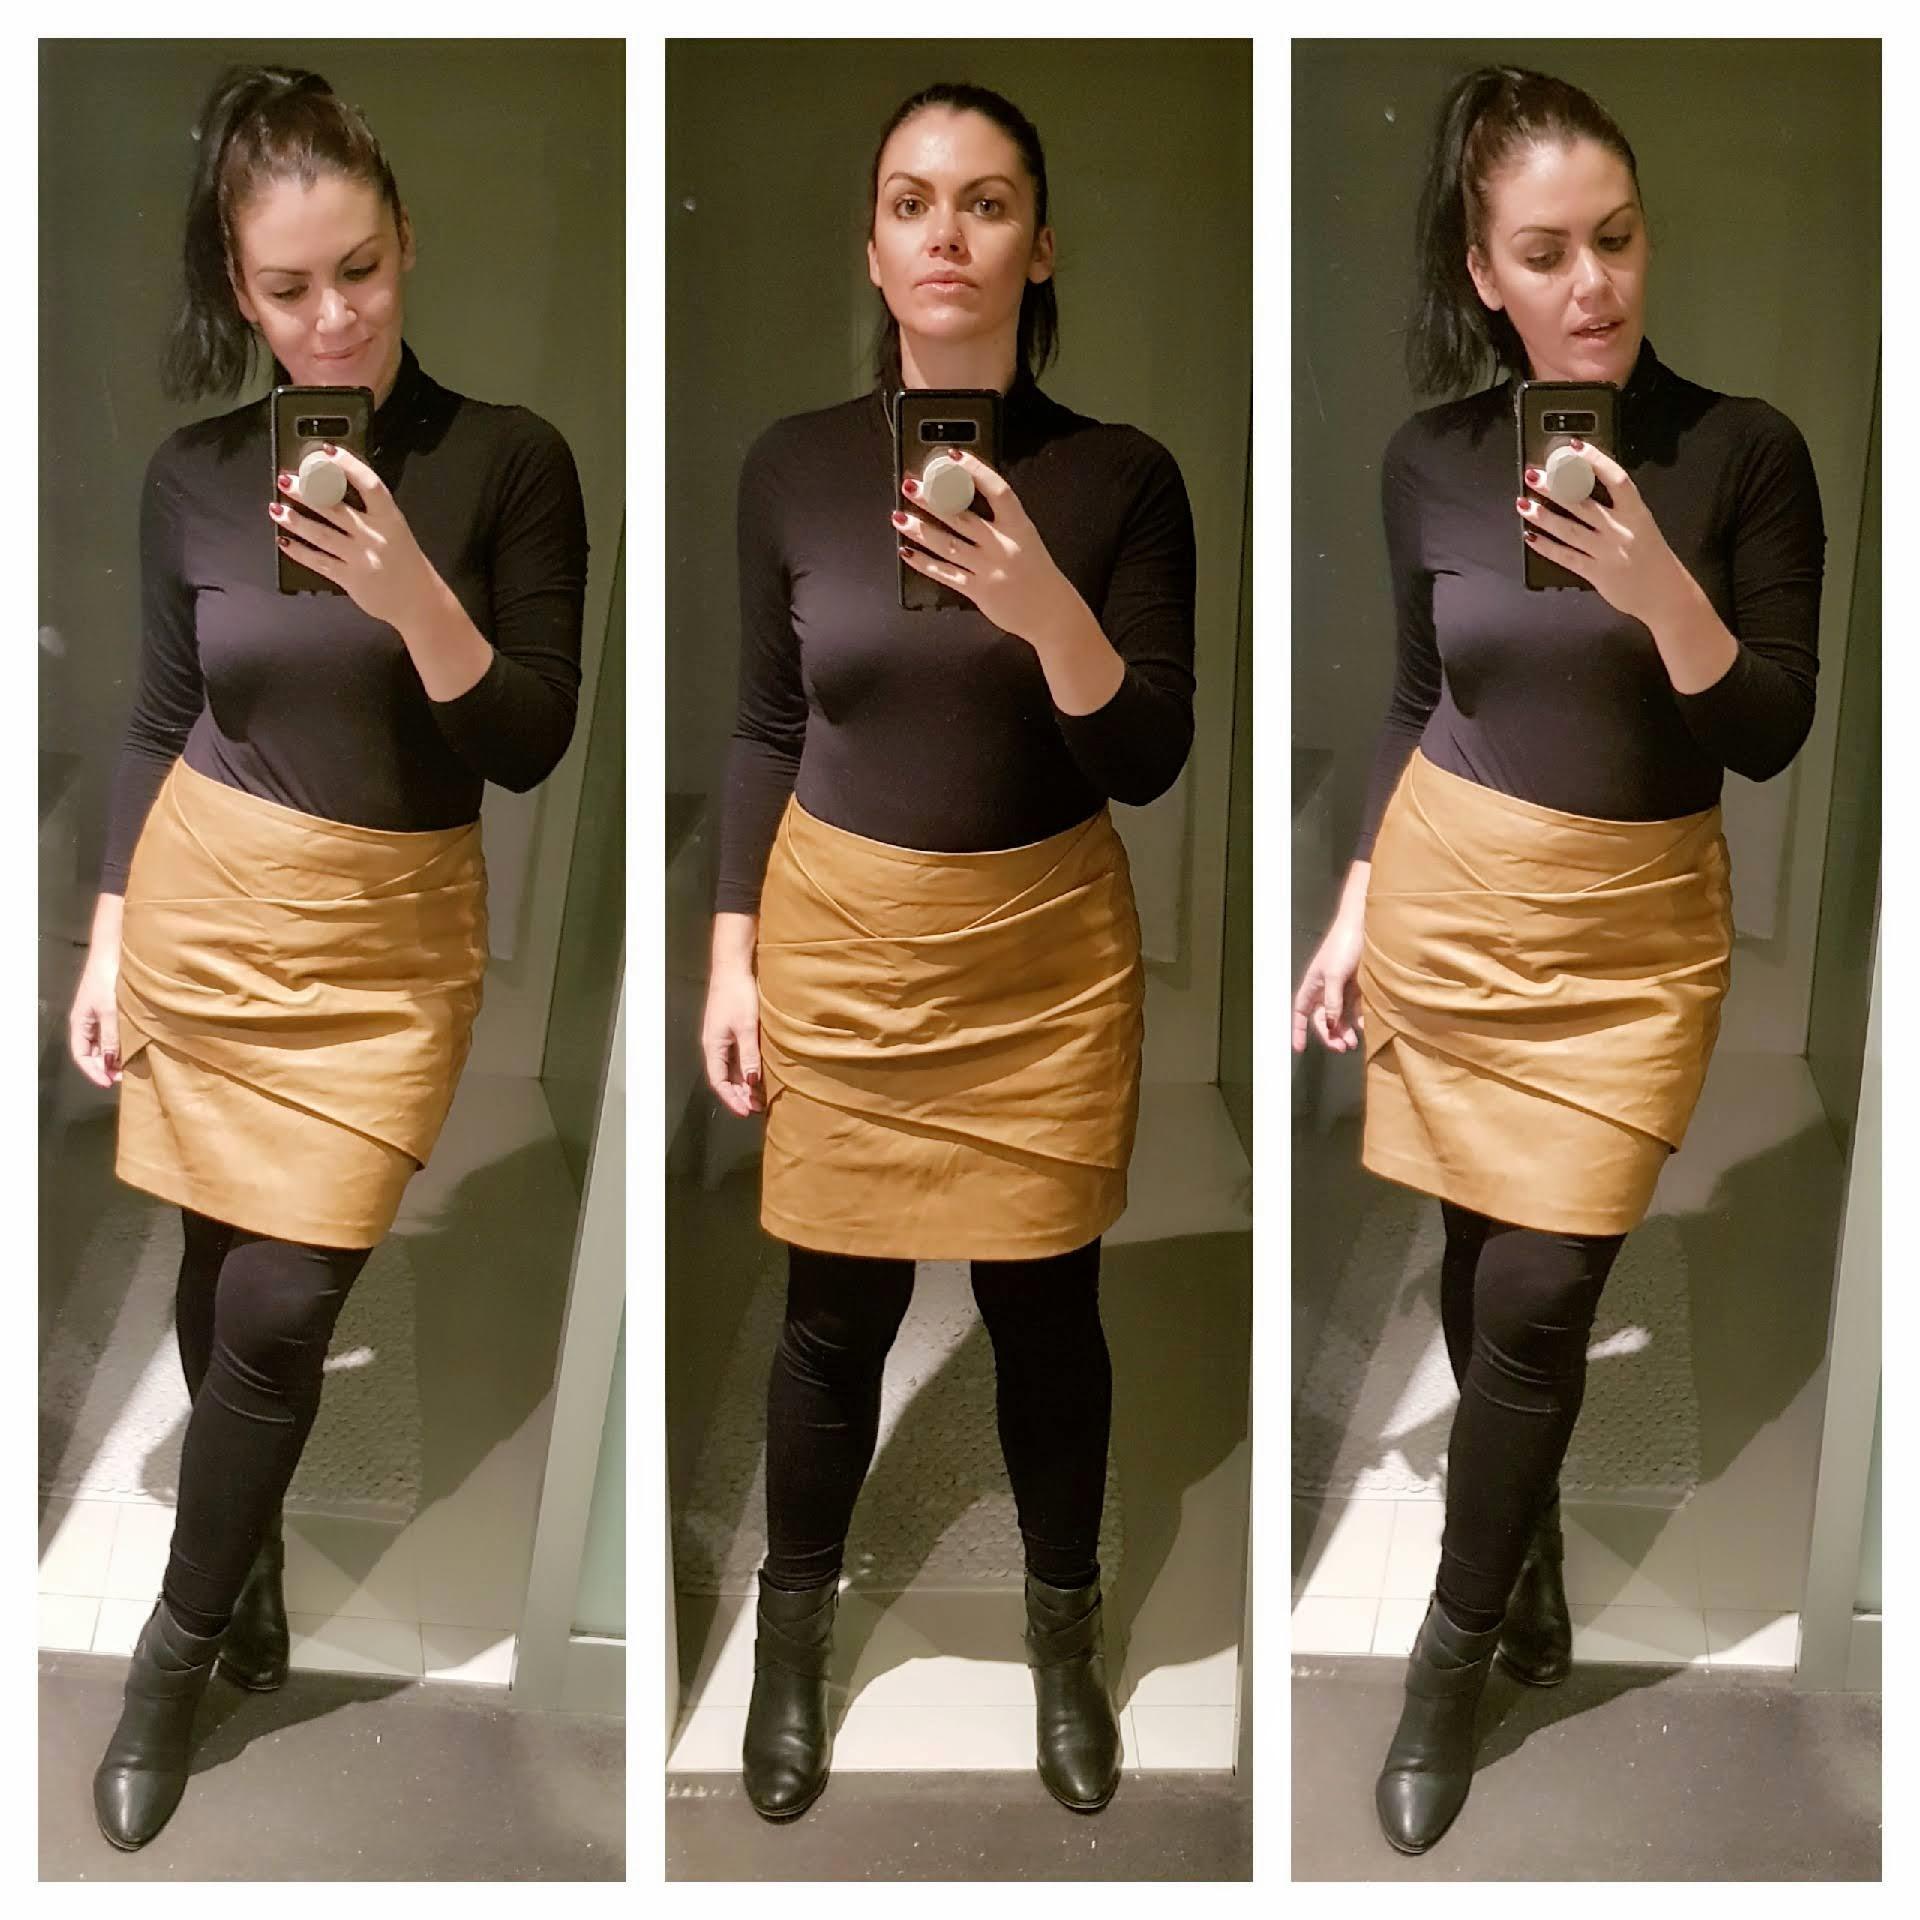 samantha clark waters fashion lifestyle blog level up style classy